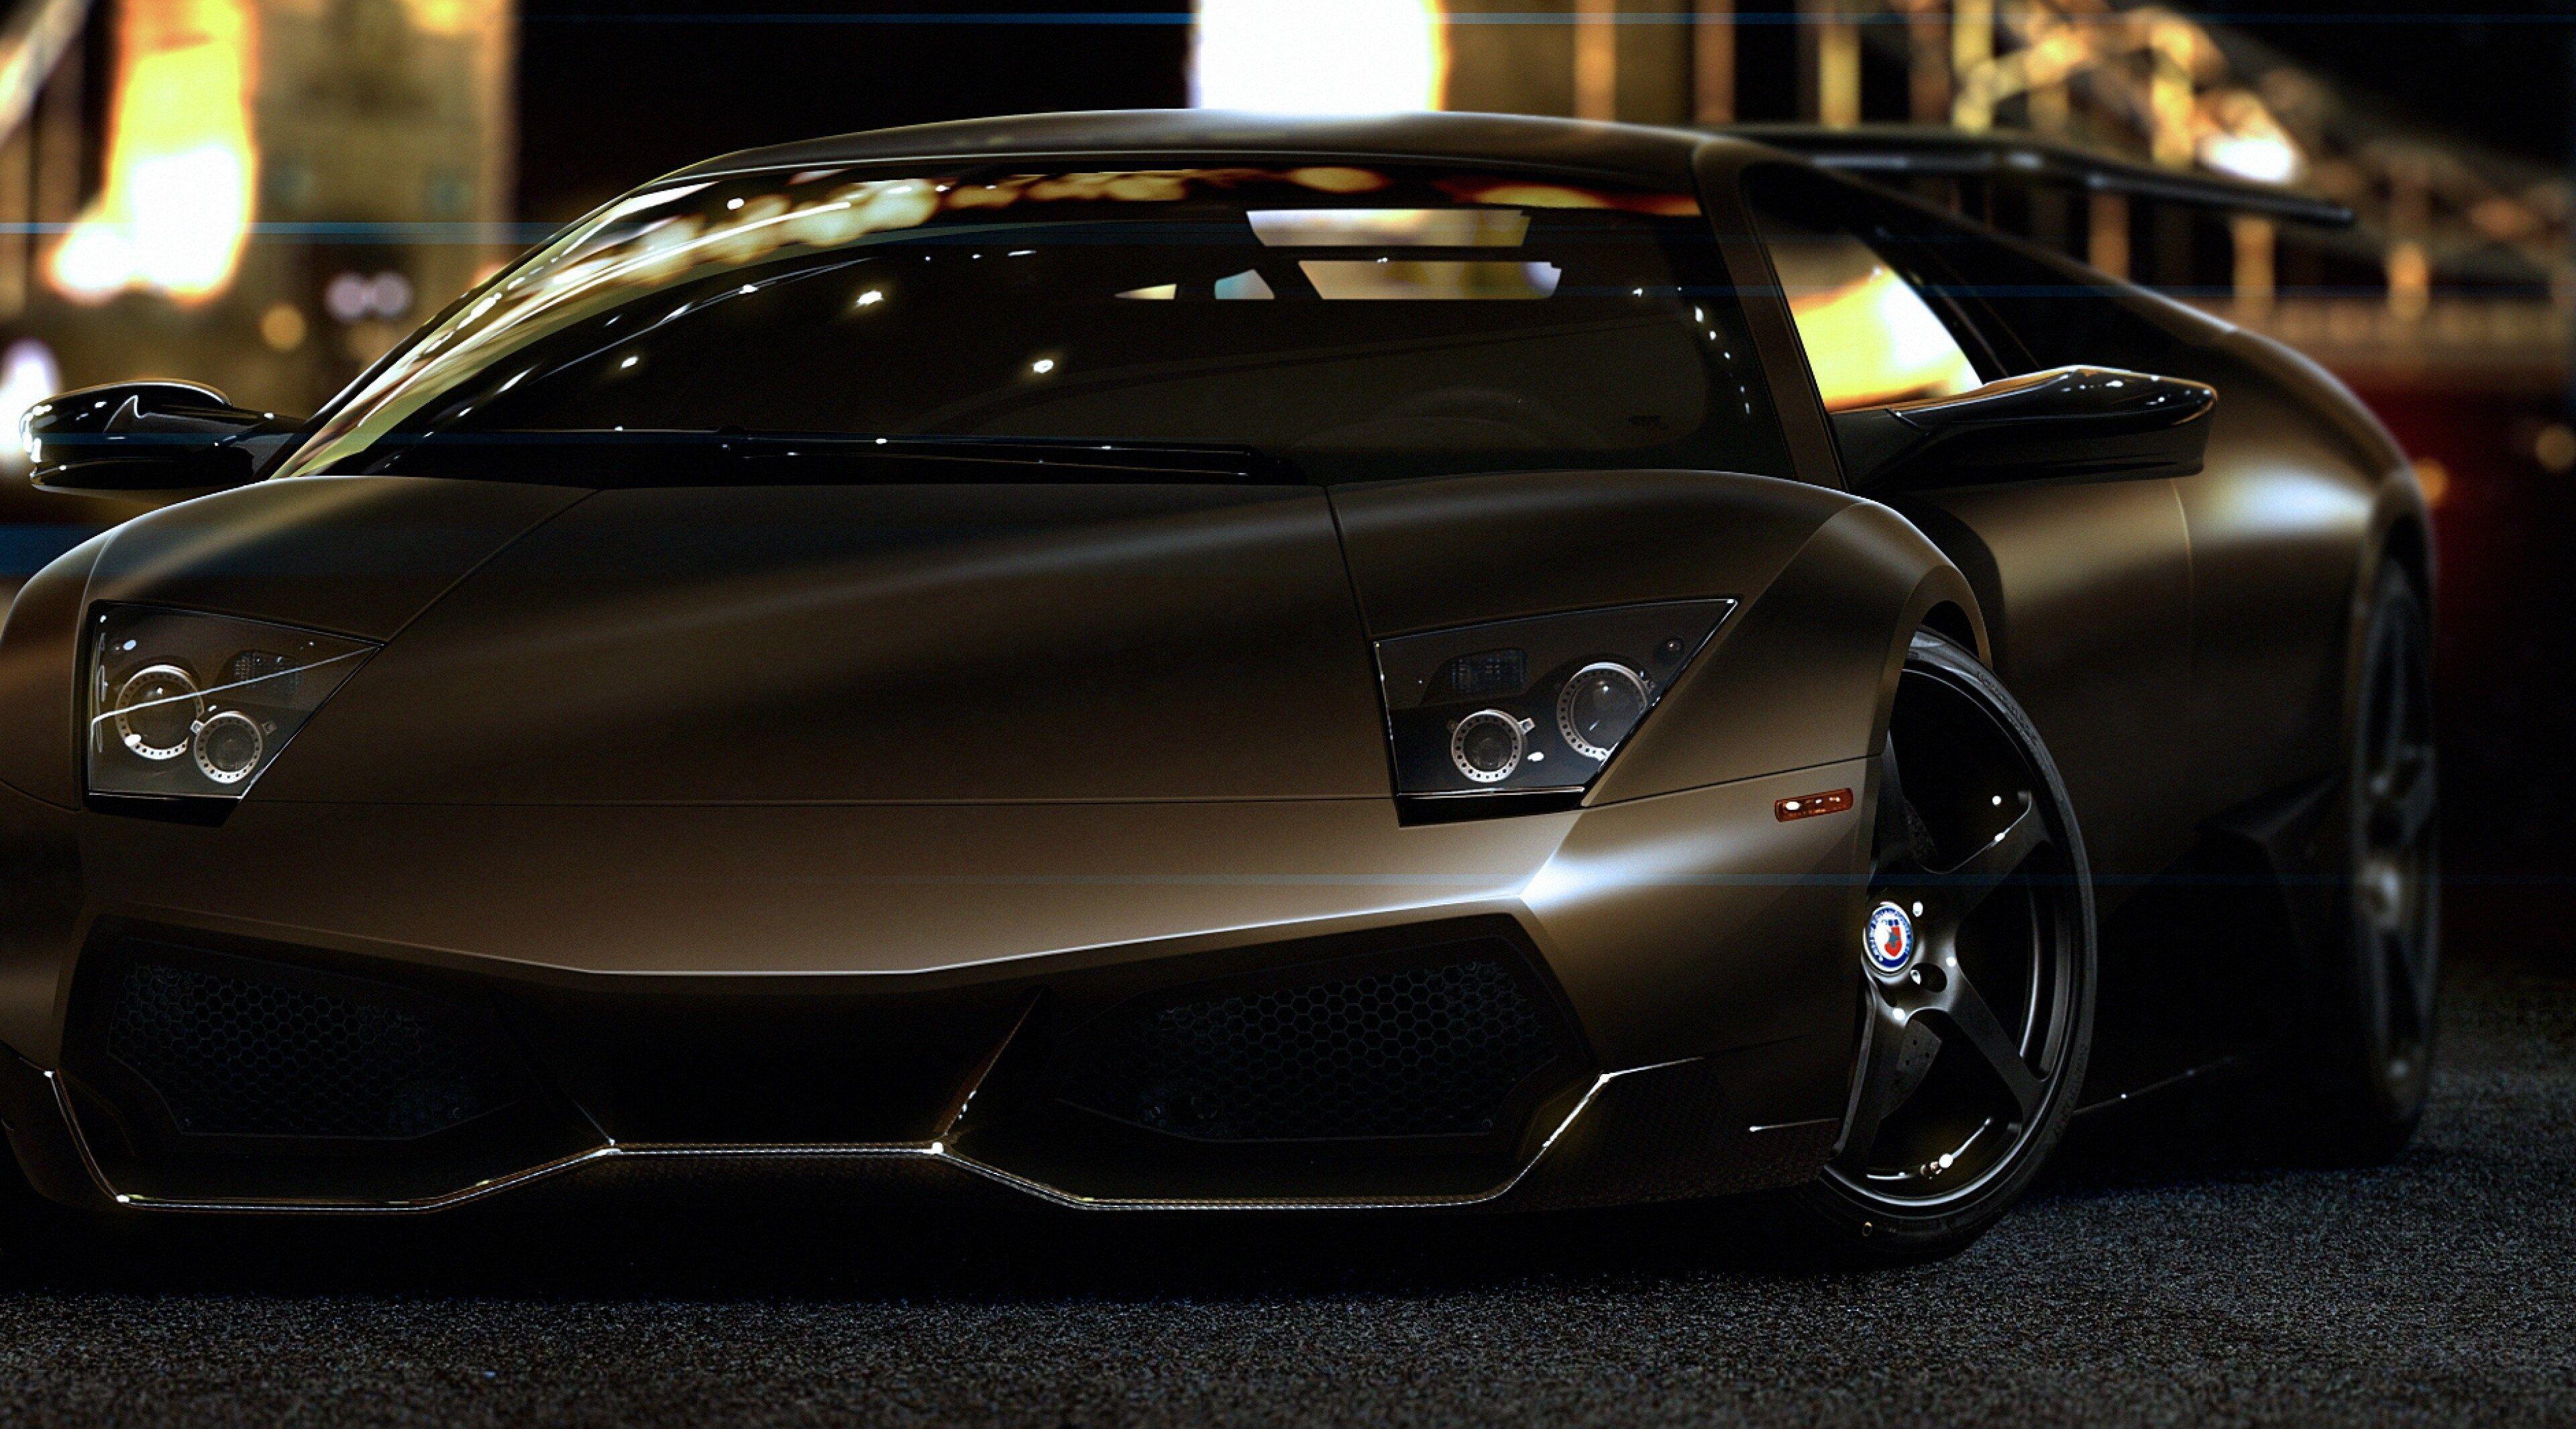 3840x2130 Lamborghini Murcielago 4k Computer Wallpaper Free Download